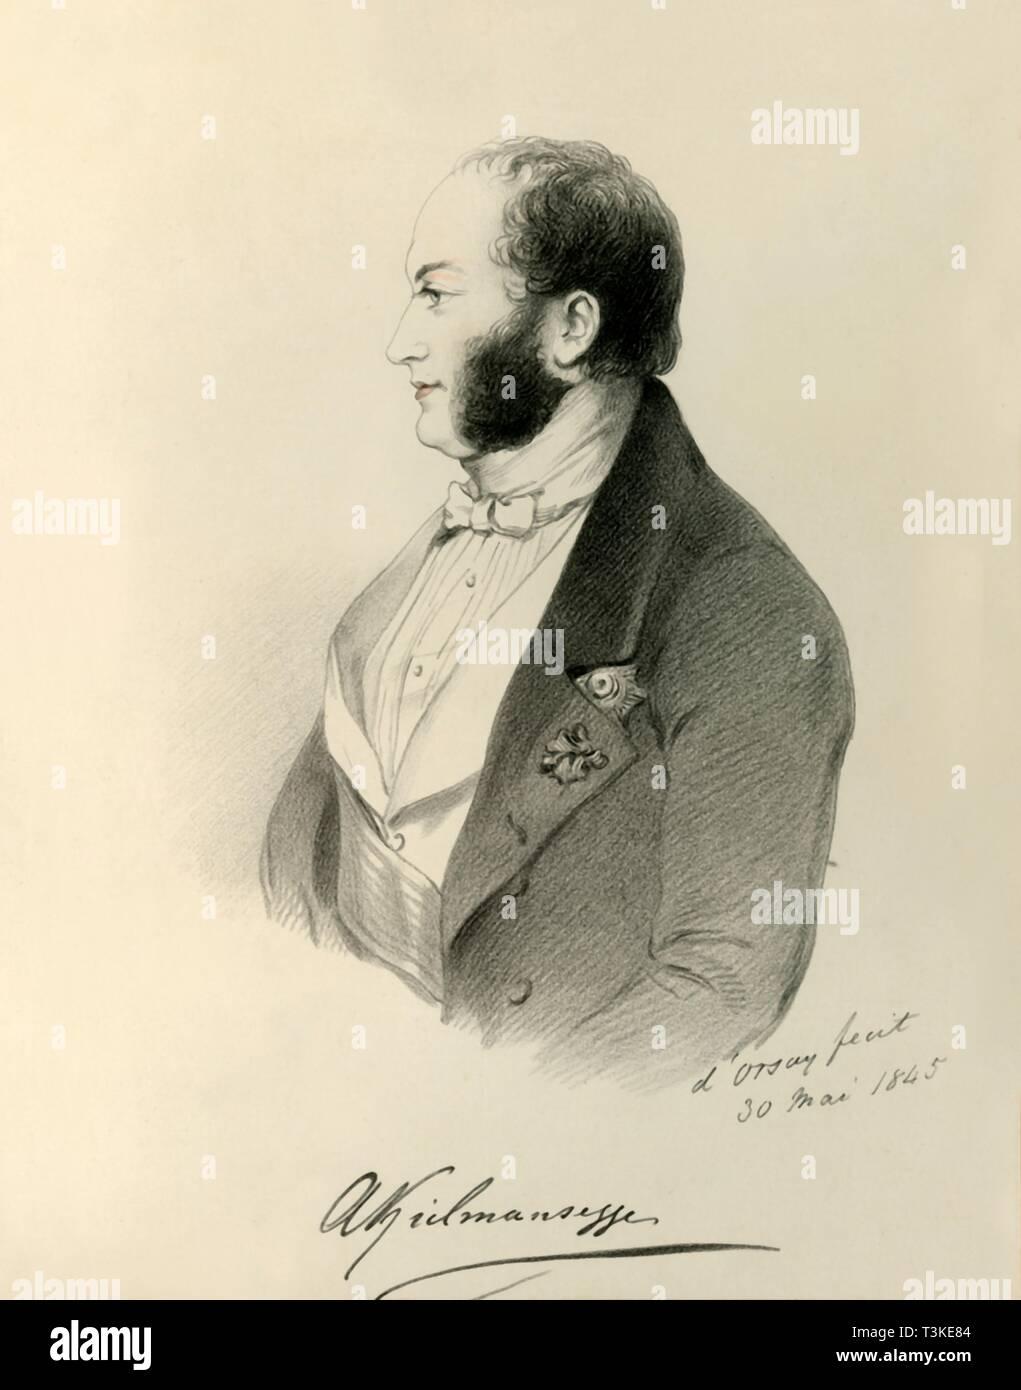 'Count Kielmansegg', 1845. Creator: Richard James Lane. - Stock Image